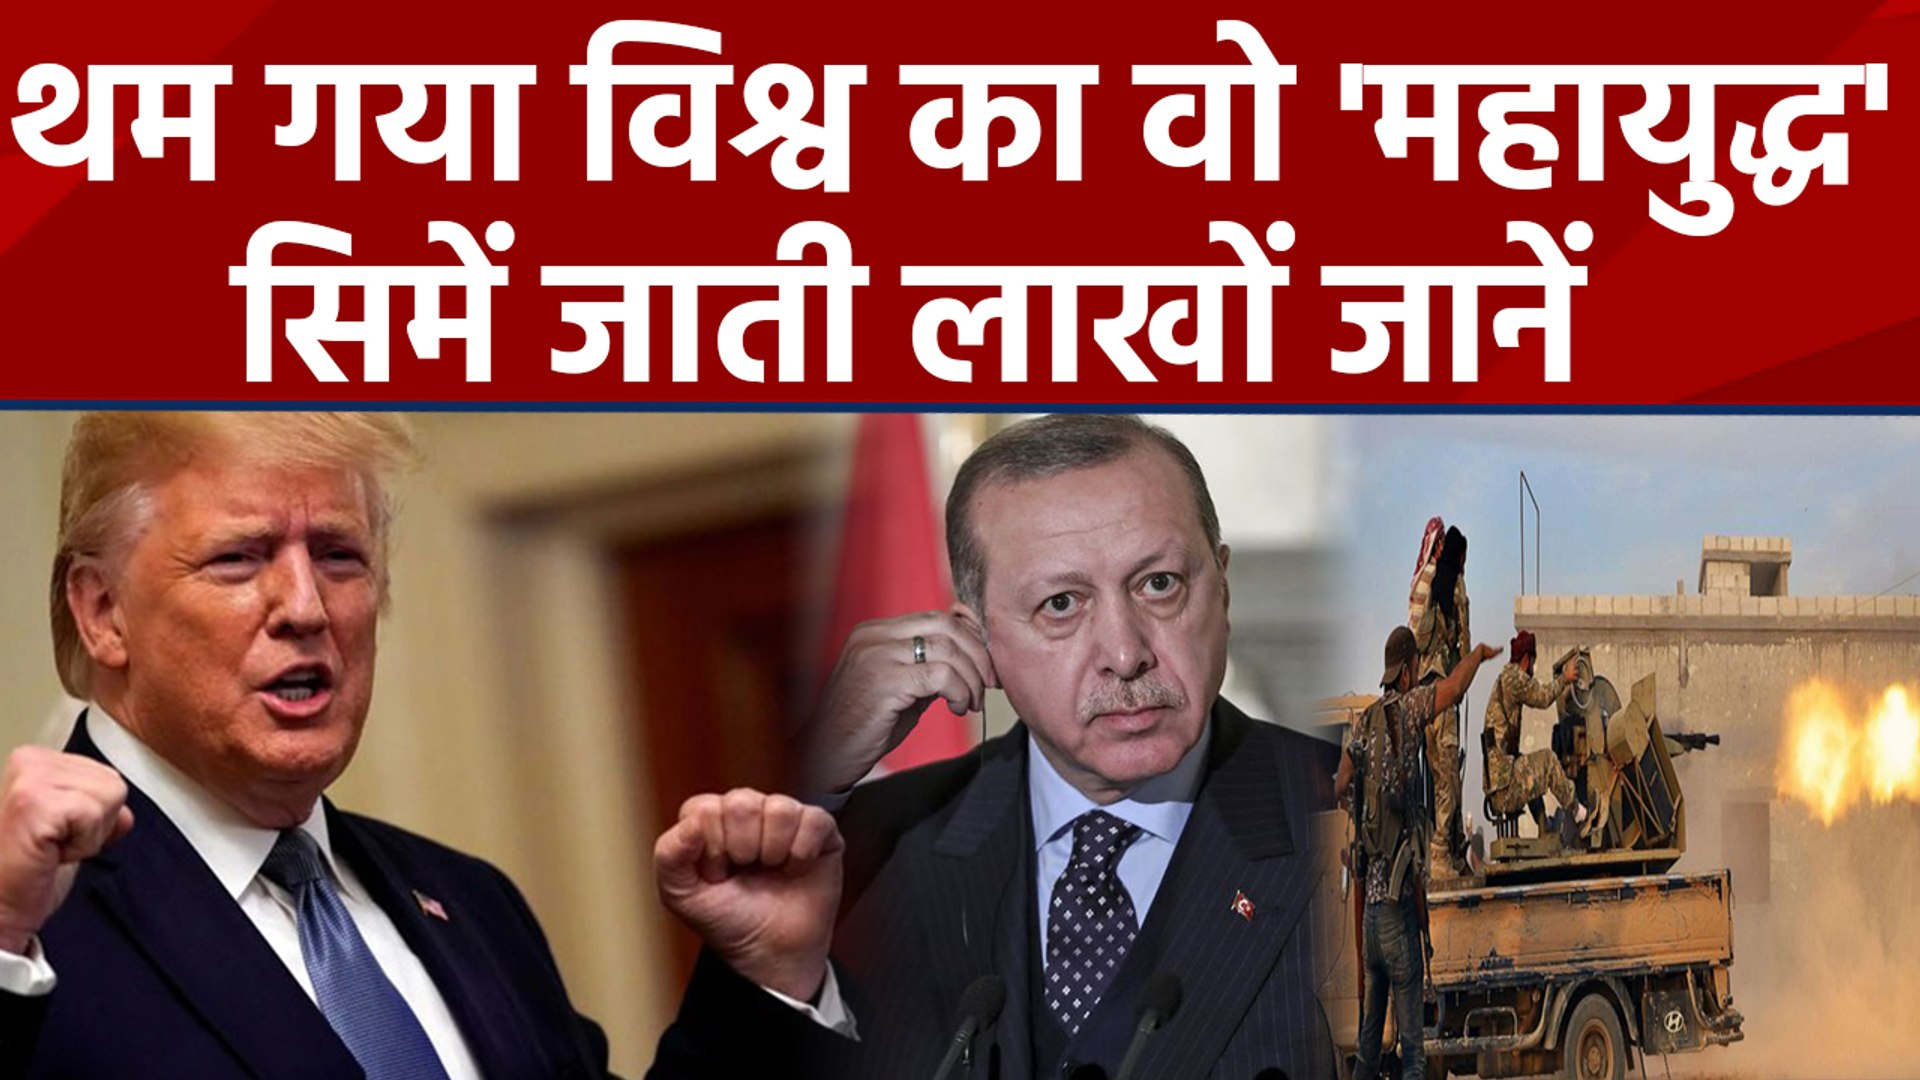 Turkey syria war stopped, America president Donald trump happy  वनइंडिया हिंदी